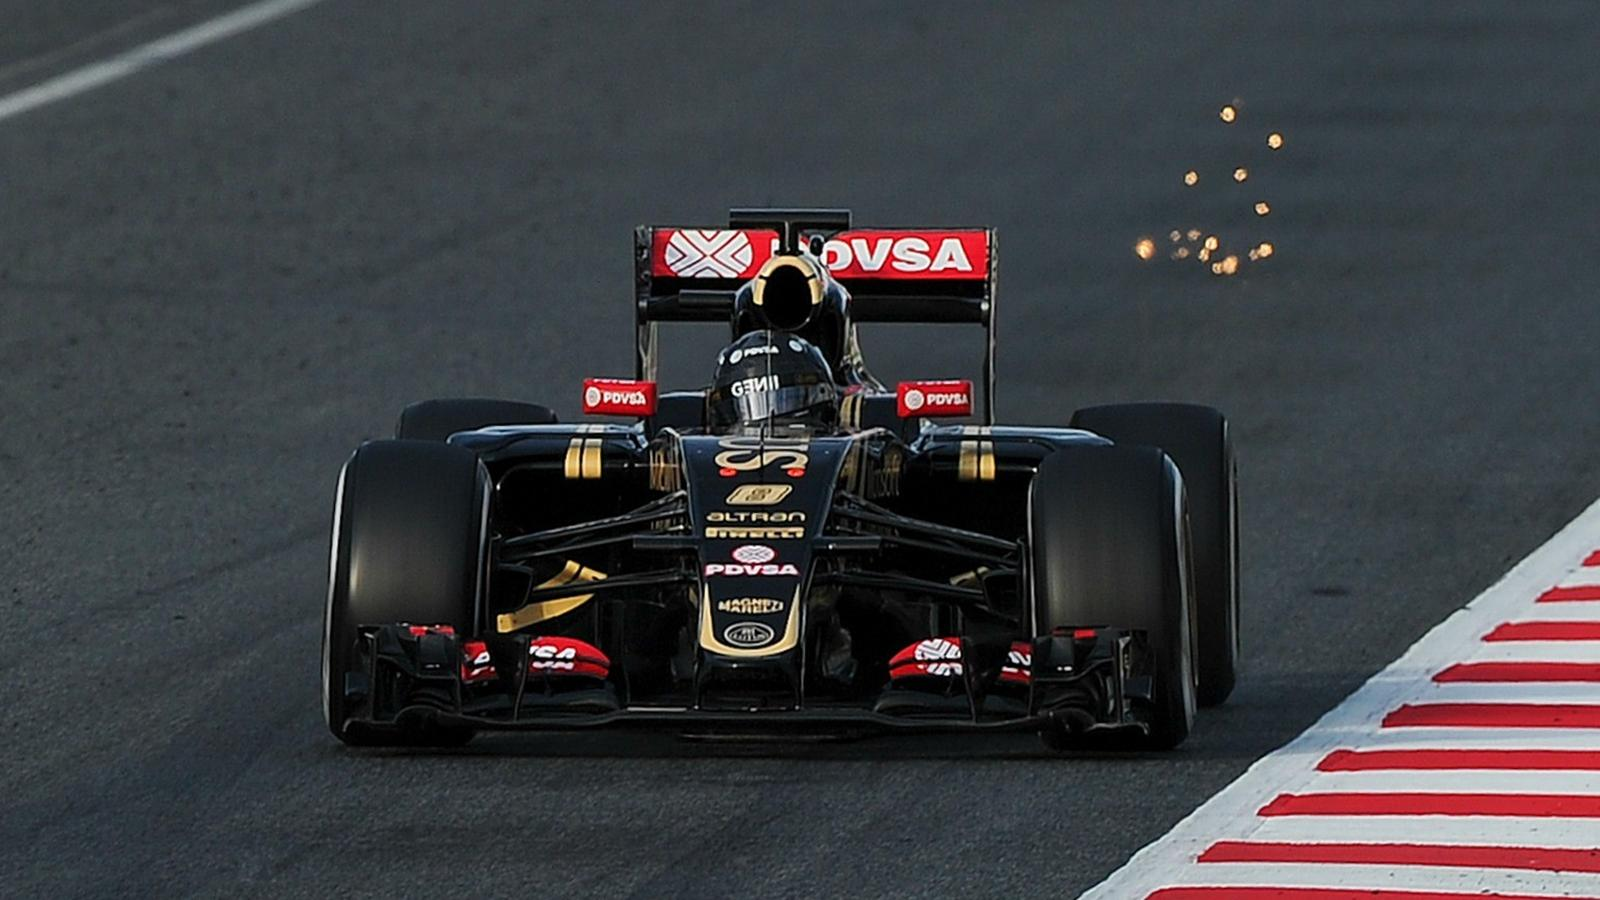 Romain Grosjean, Piloto de Formula 1, em 2015 - eurosport.com